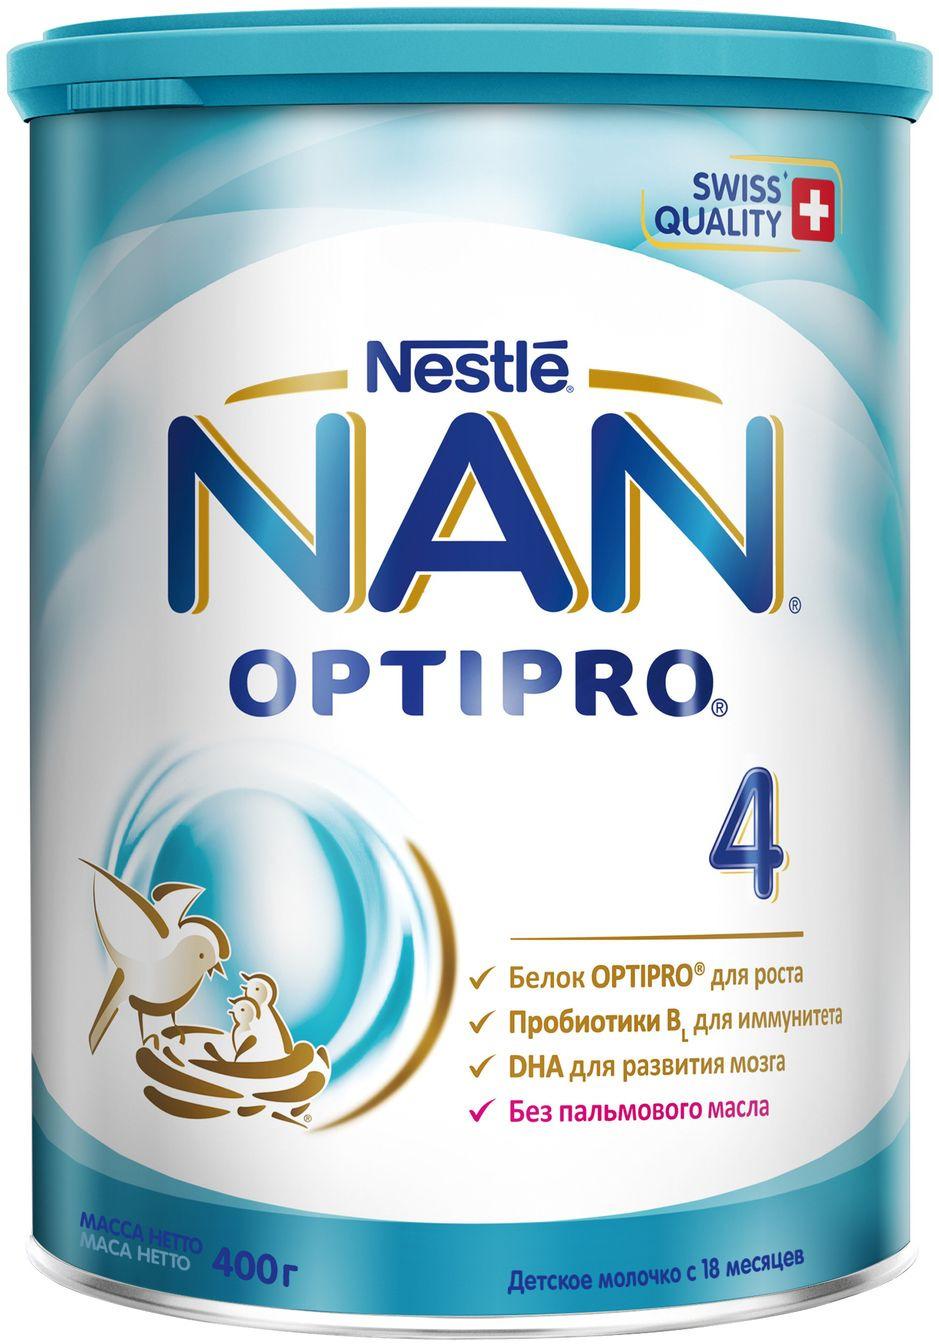 NAN 4 OPTIPRO молочко, с 18 месяцев, 400 г